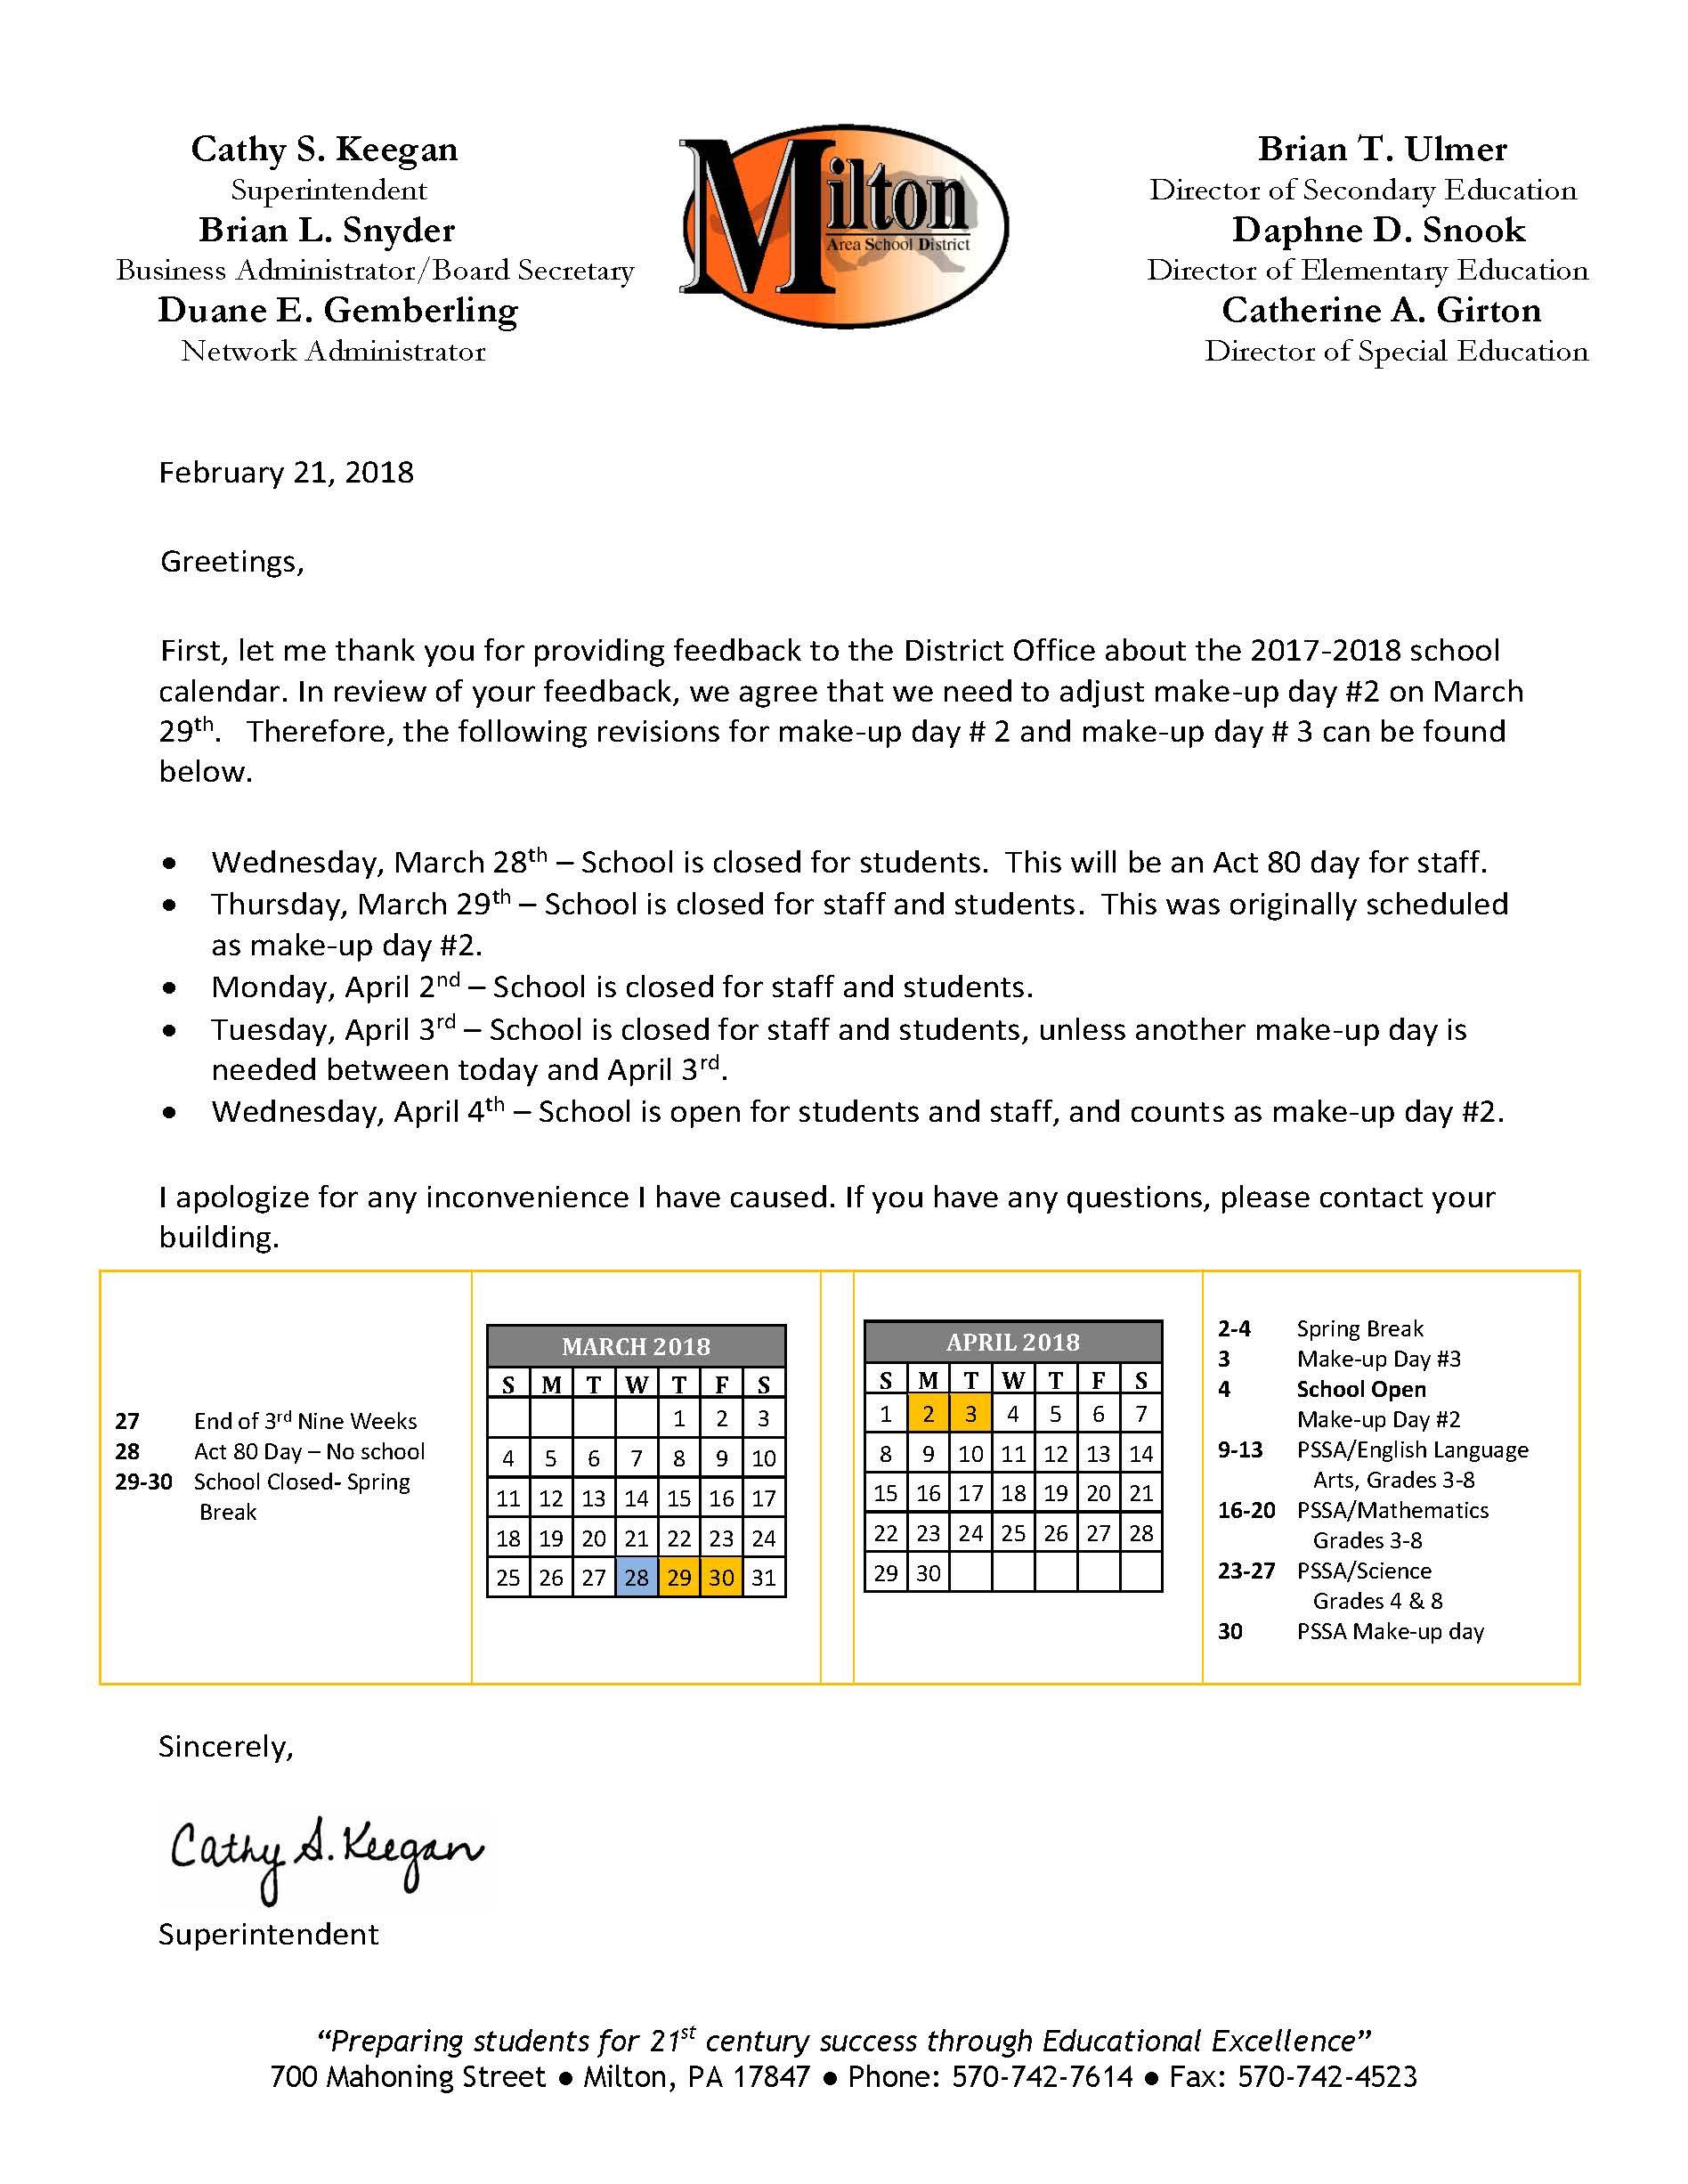 School Calendar revision letter